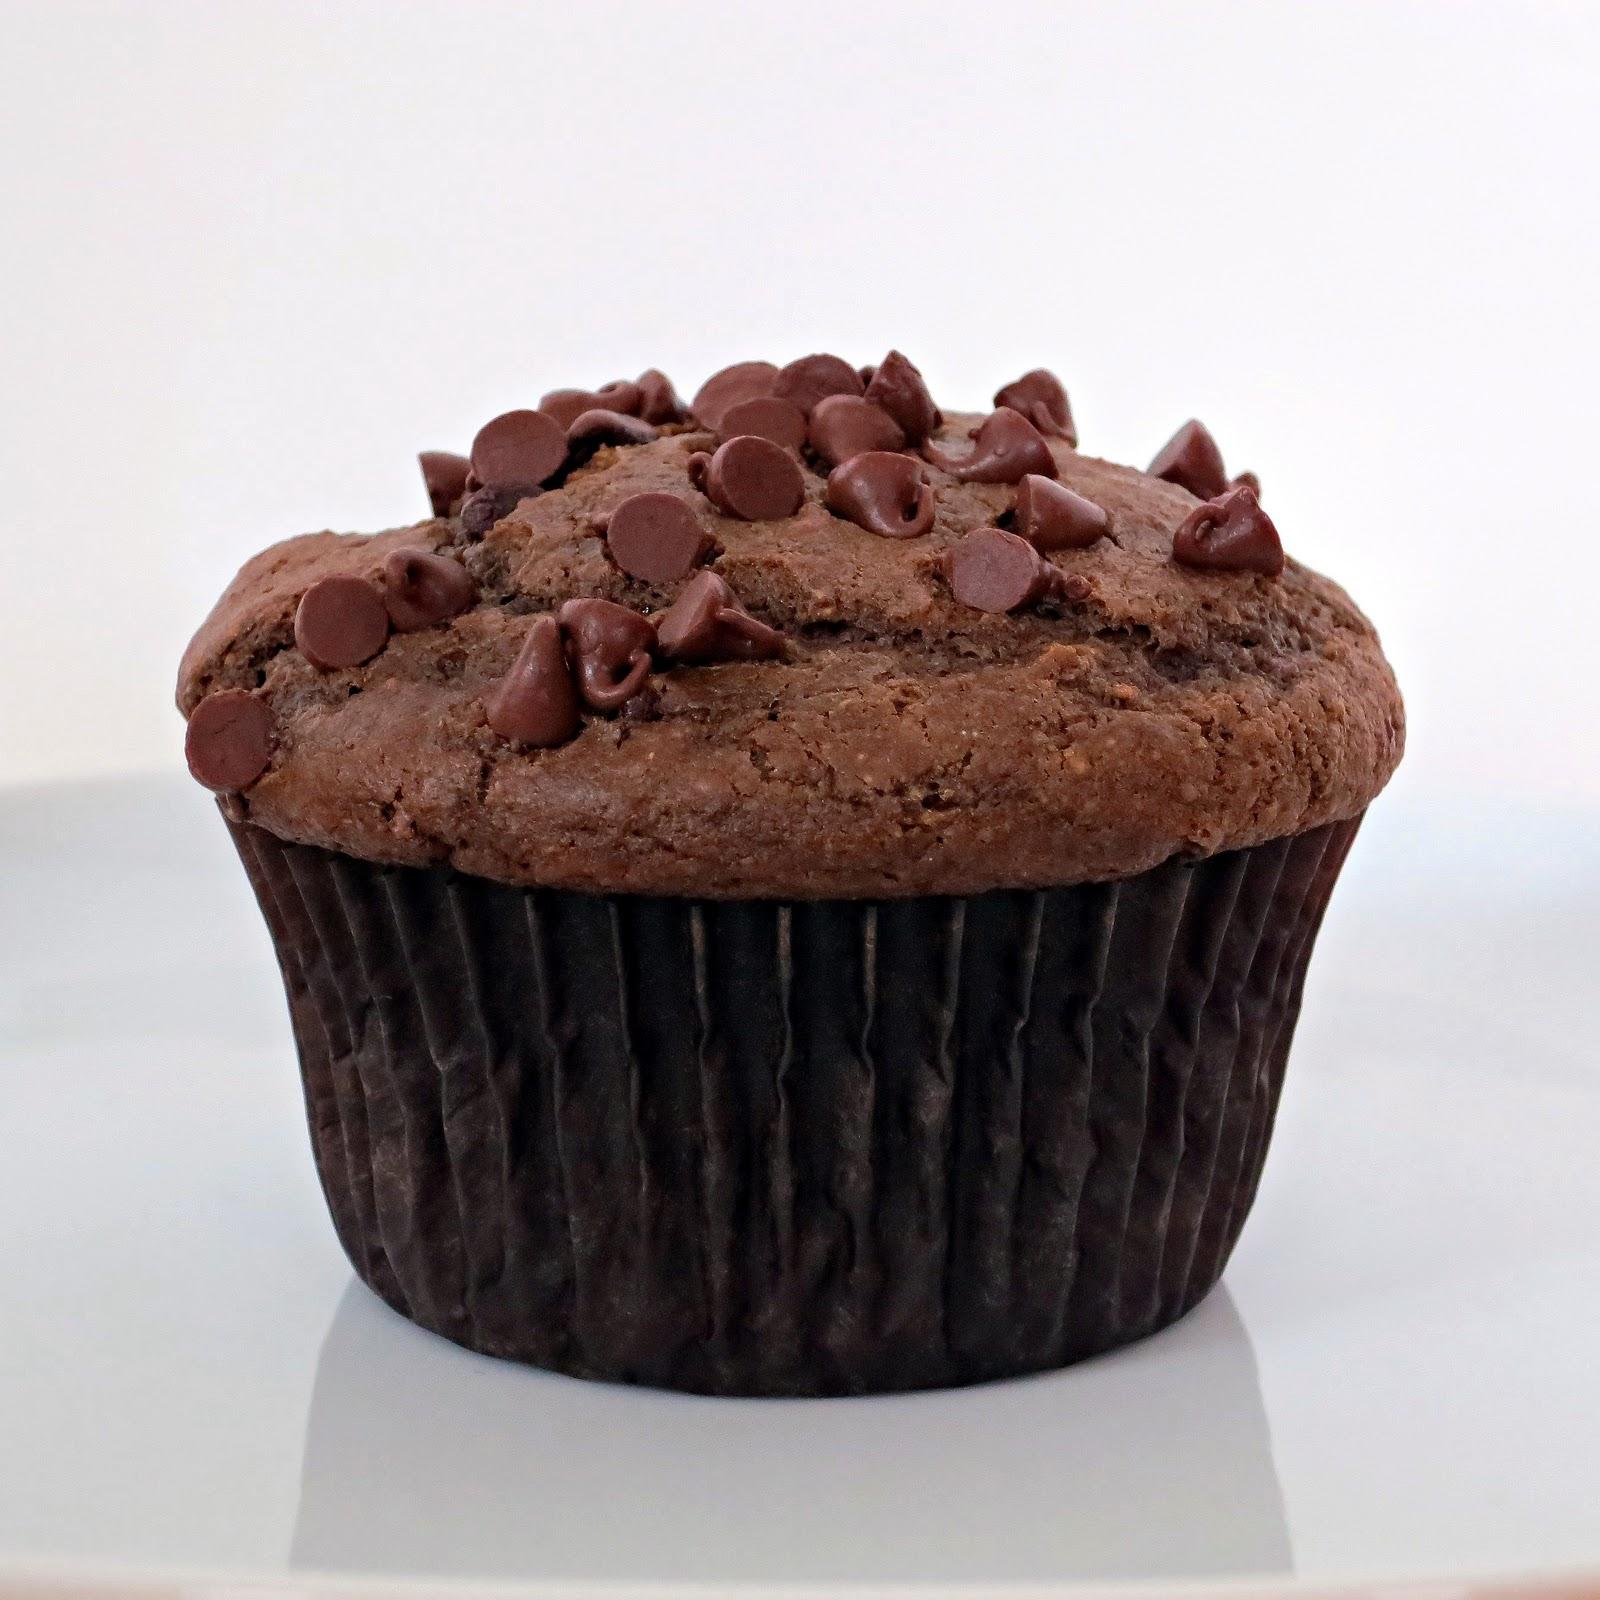 Chocolate Muffin Breakfast Recipes